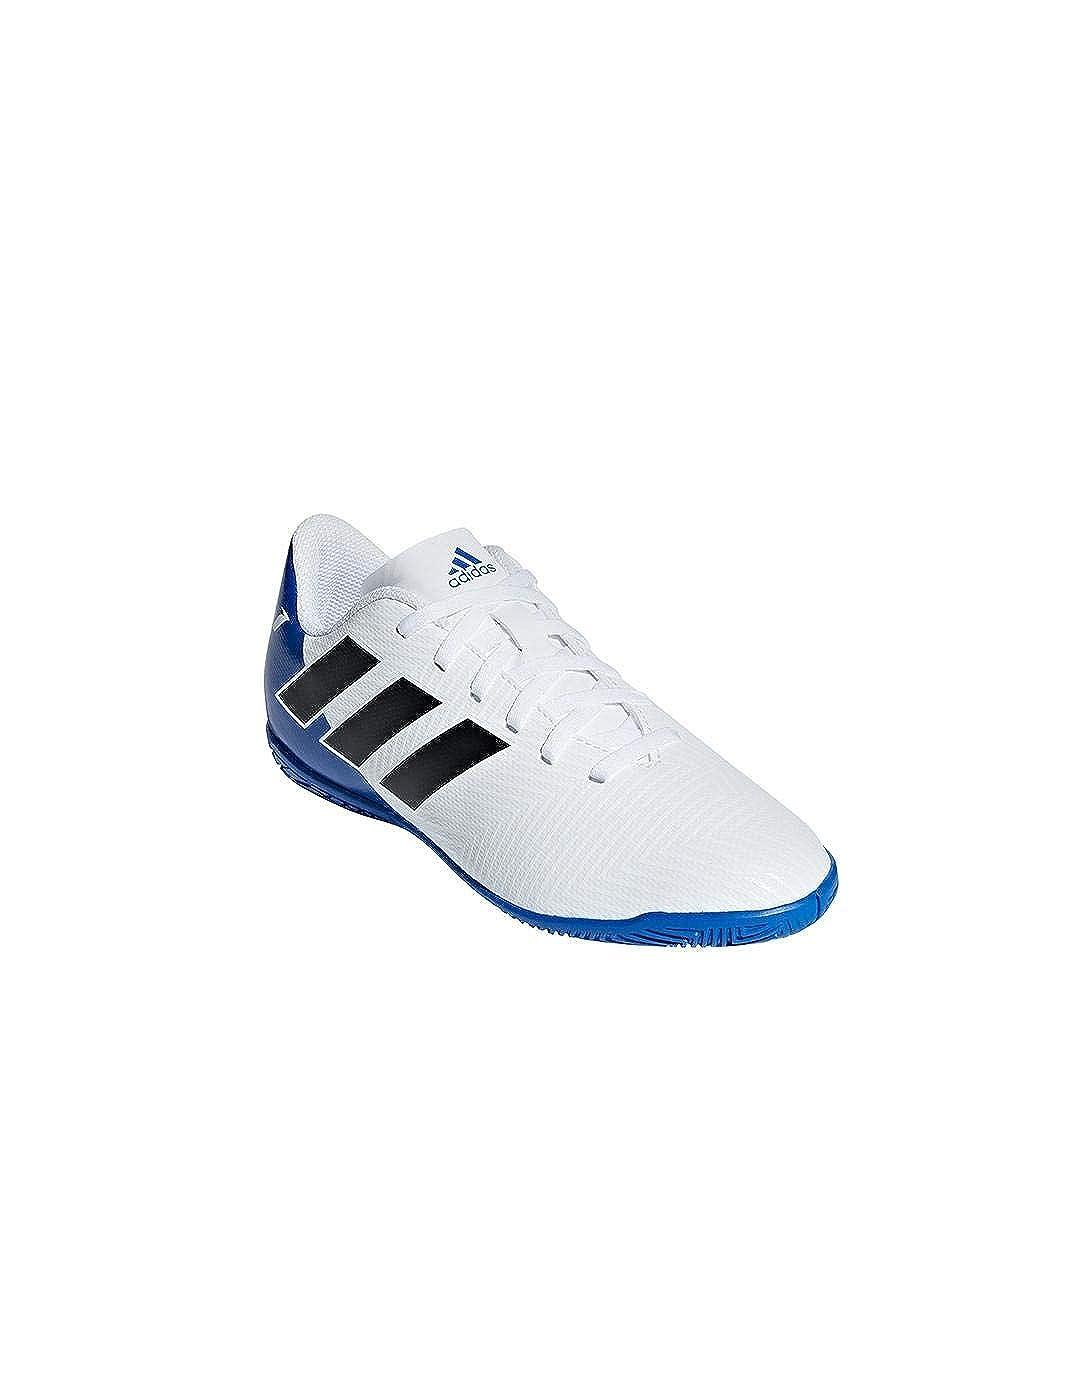 7a15626dce0ef adidas Nemeziz Messi Tango 18.4 In J